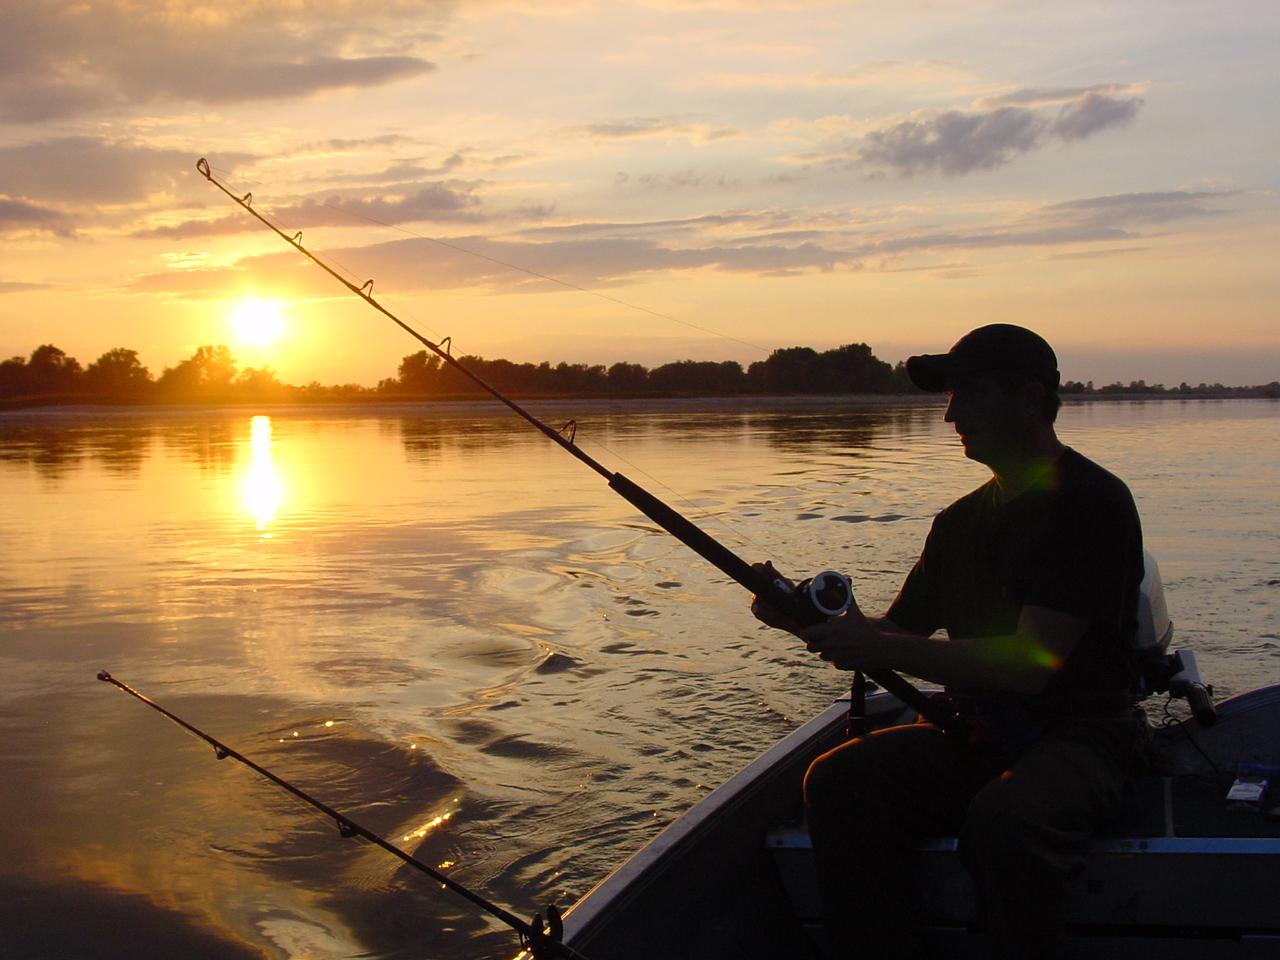 Рыбак на лодке картинка, картинку